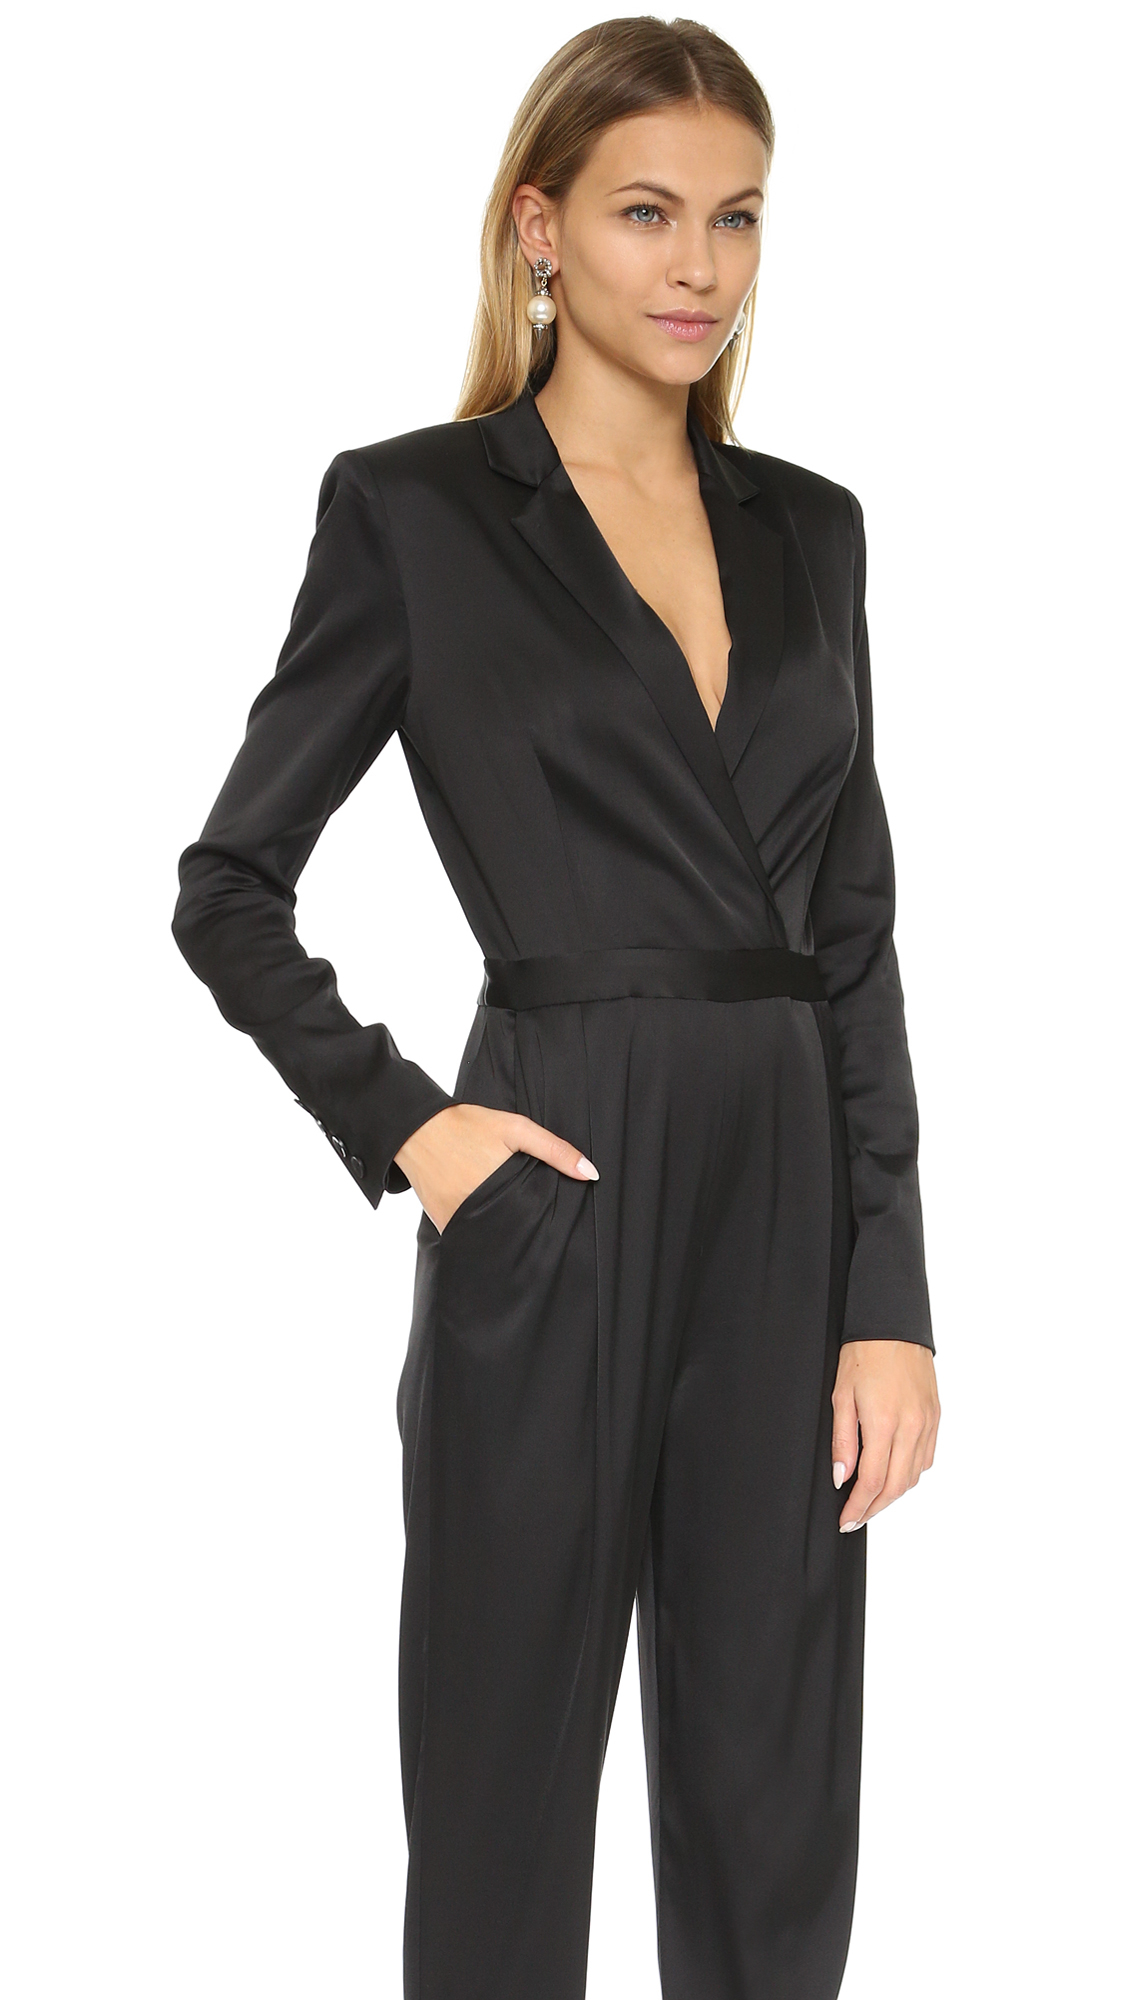 437f974ec54d Lyst - Alice + Olivia Violetta Tuxedo Jumpsuit - Black in Black